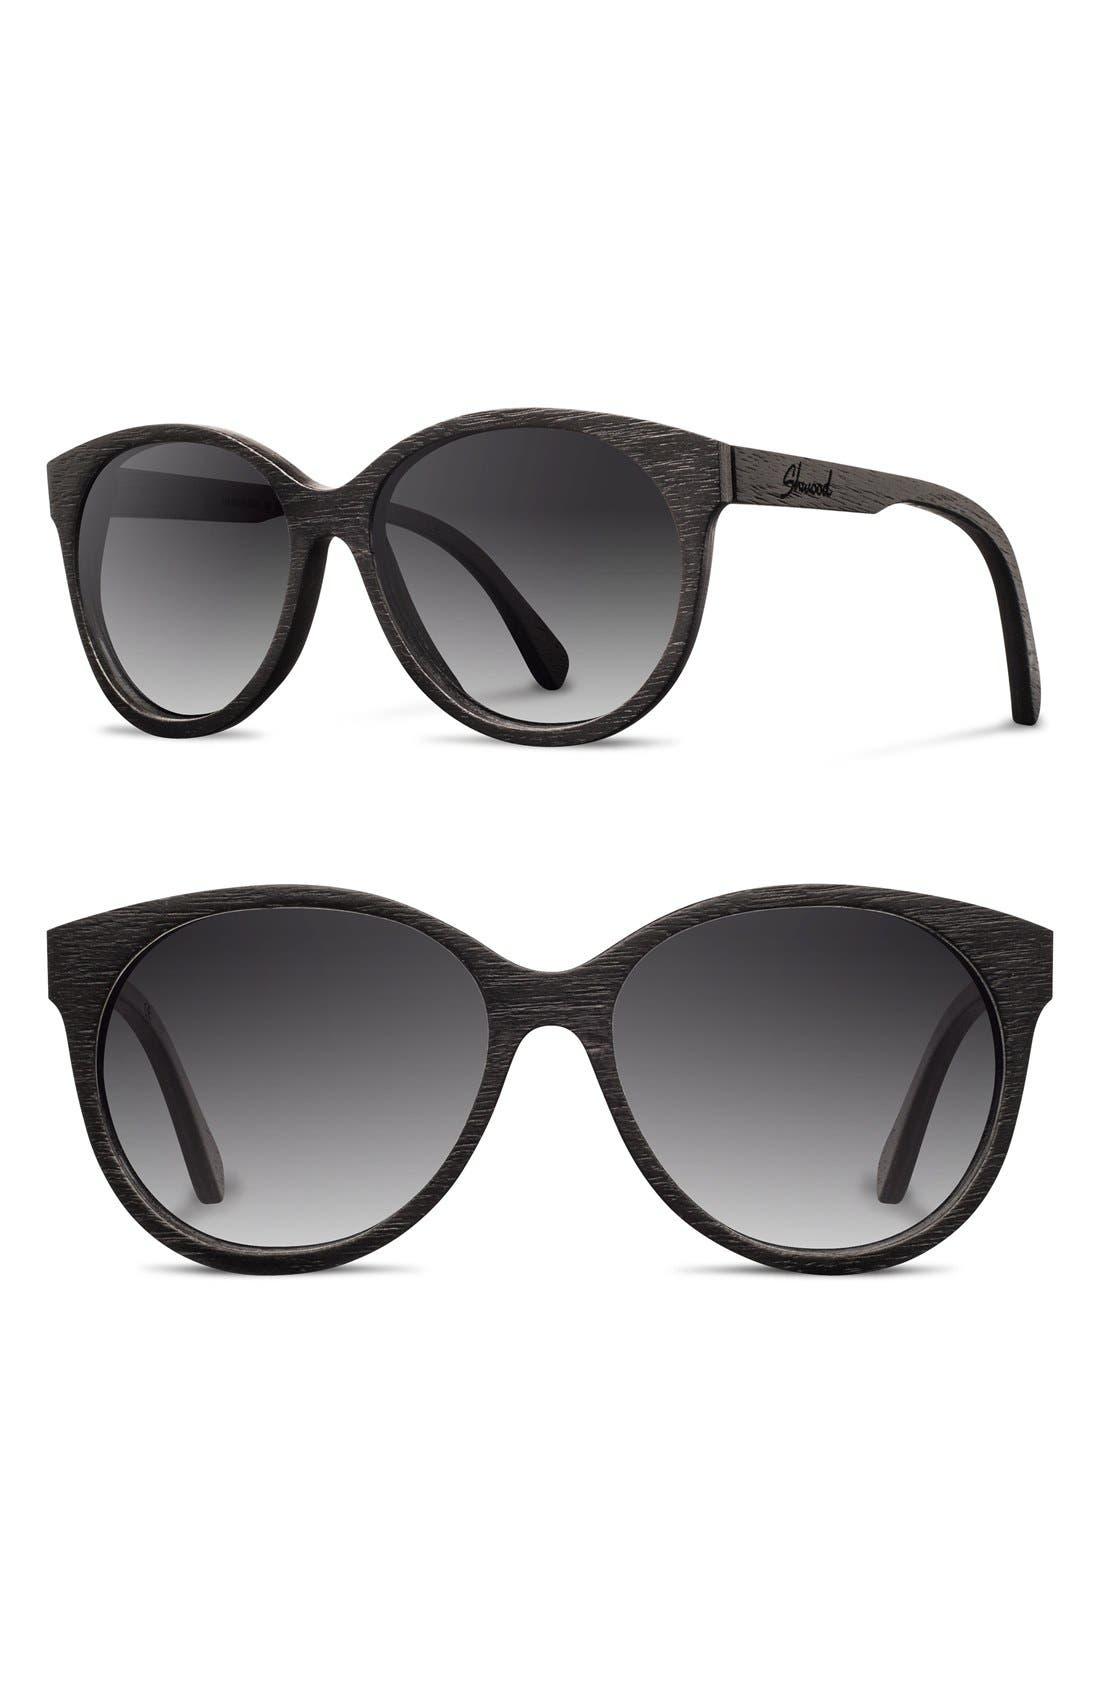 'Madison' 54mm Round Polarized Wood Sunglasses,                             Main thumbnail 1, color,                             Black/ Grey Fade Polar